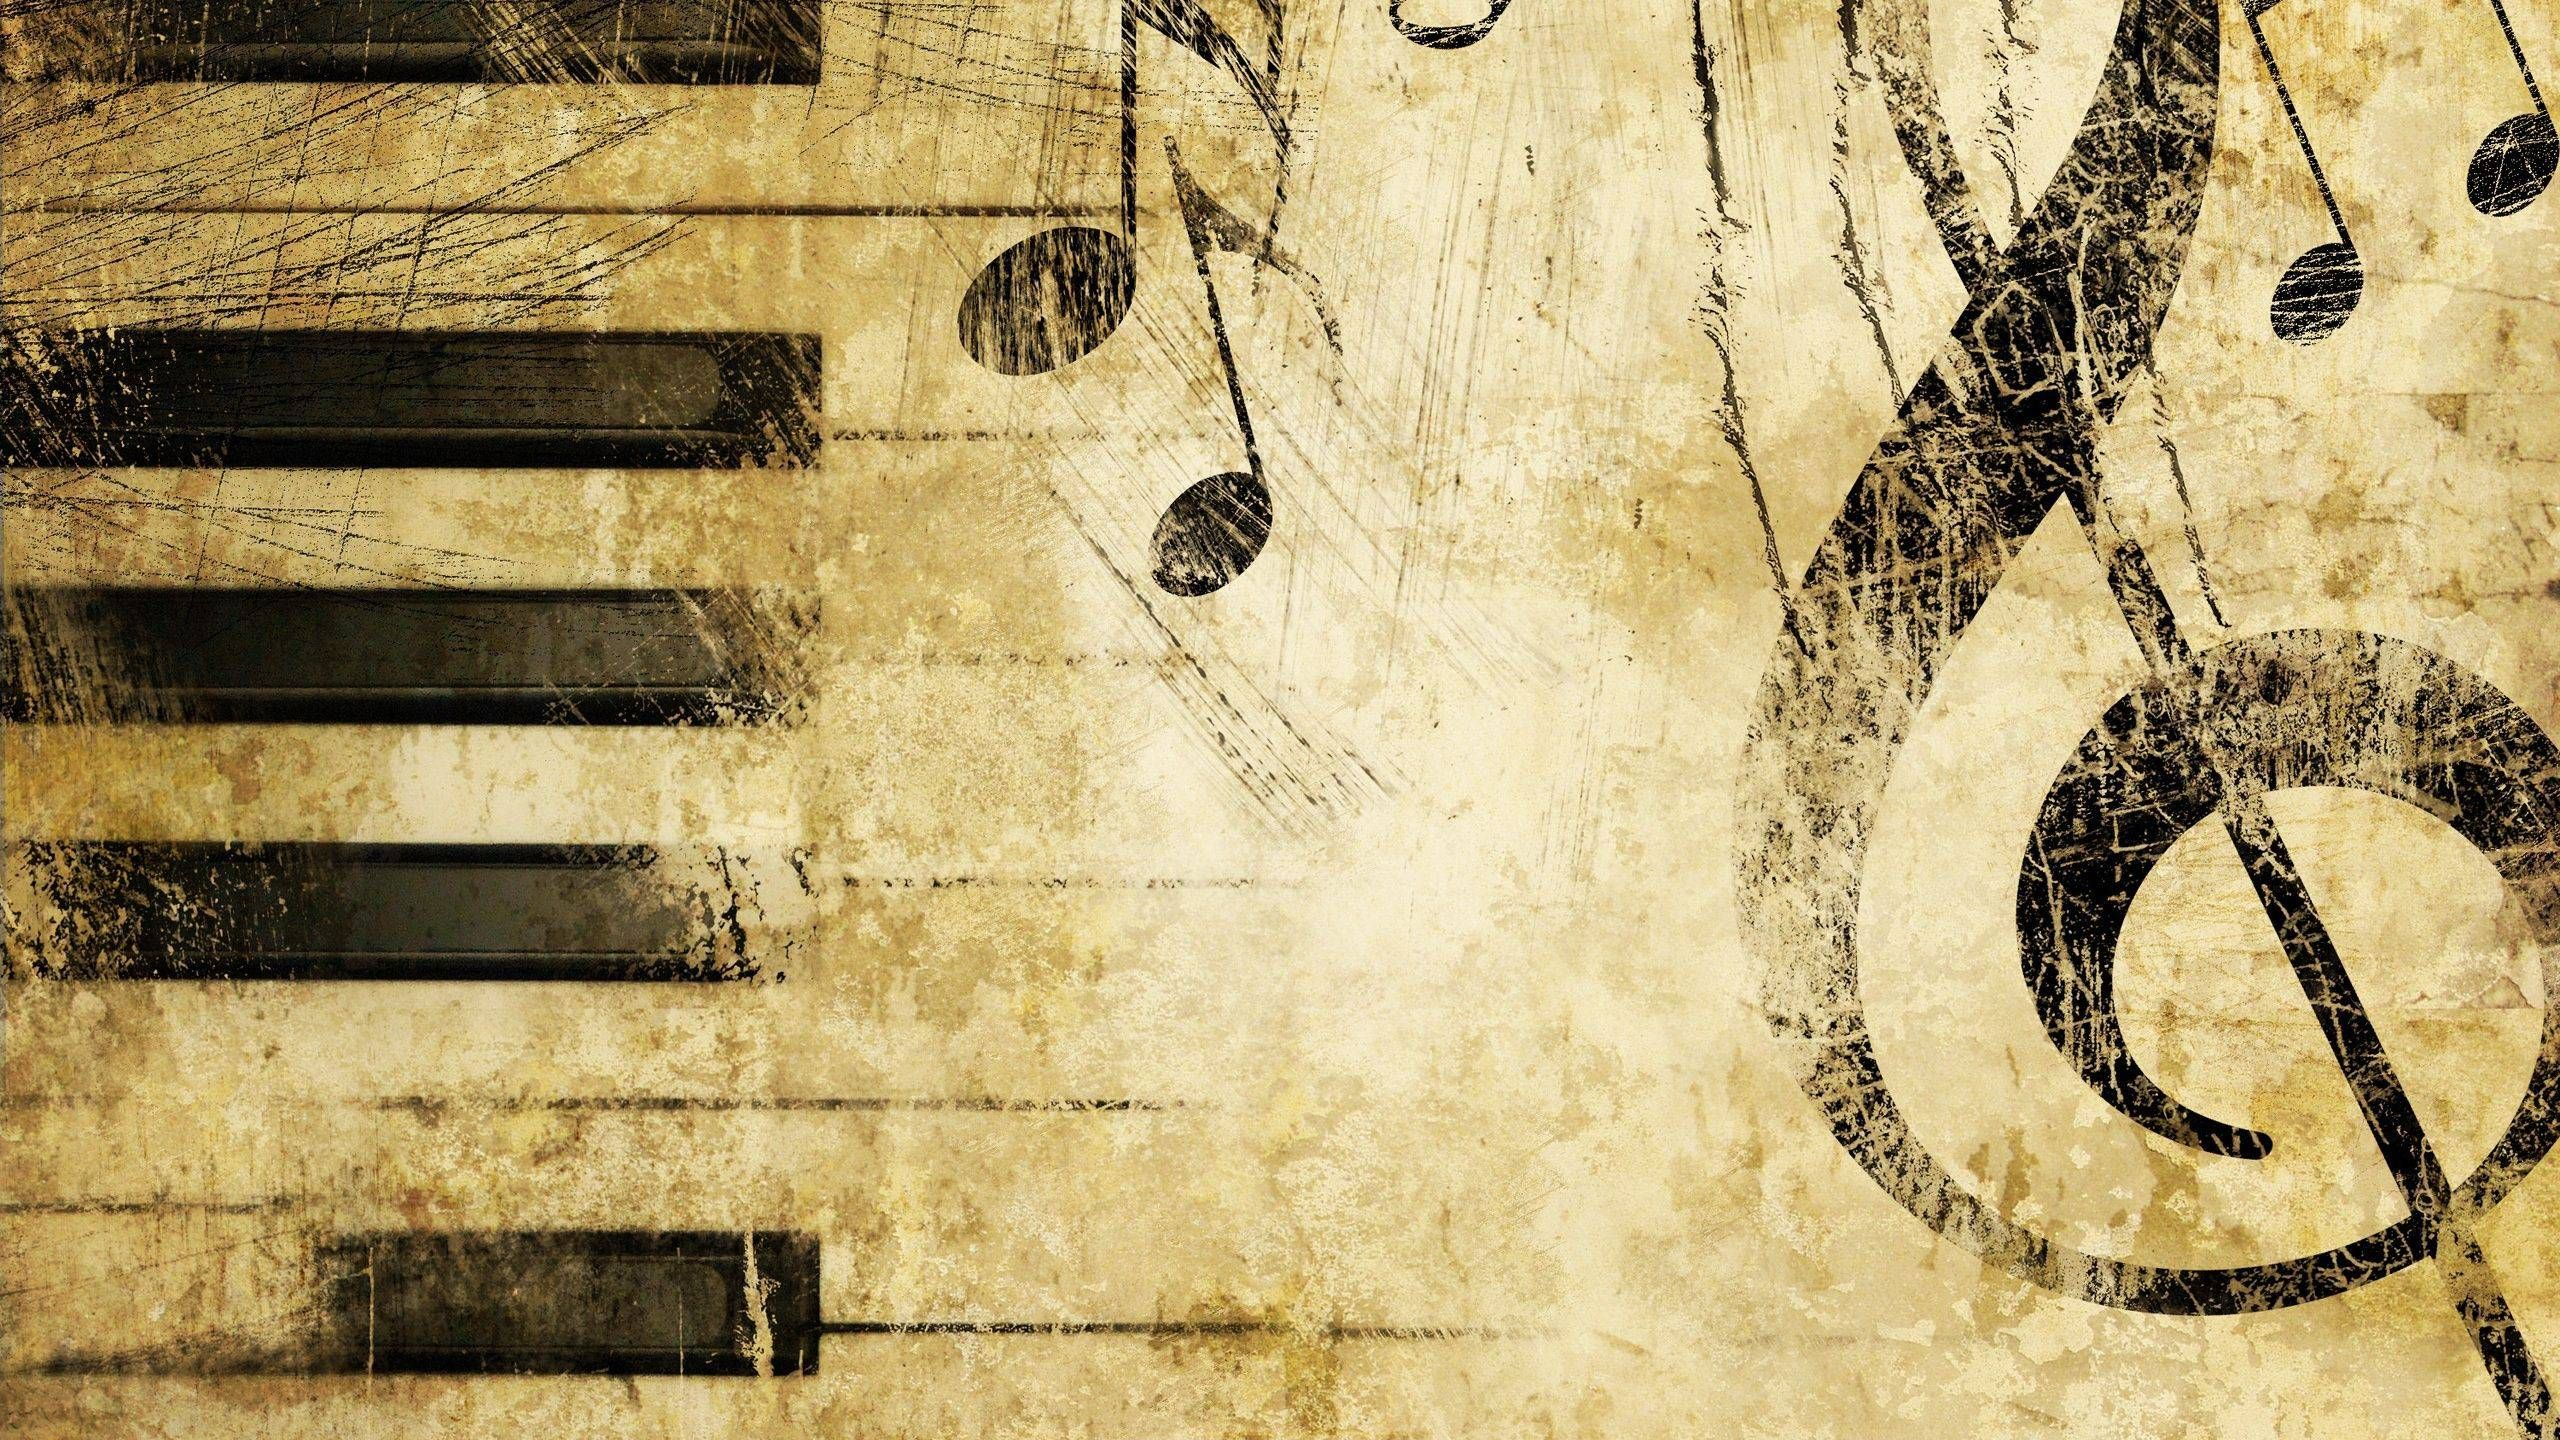 rotating piano wallpapers hd hd desktop wallpapers 1920a—1200 piano wallpaper adorable wallpapers